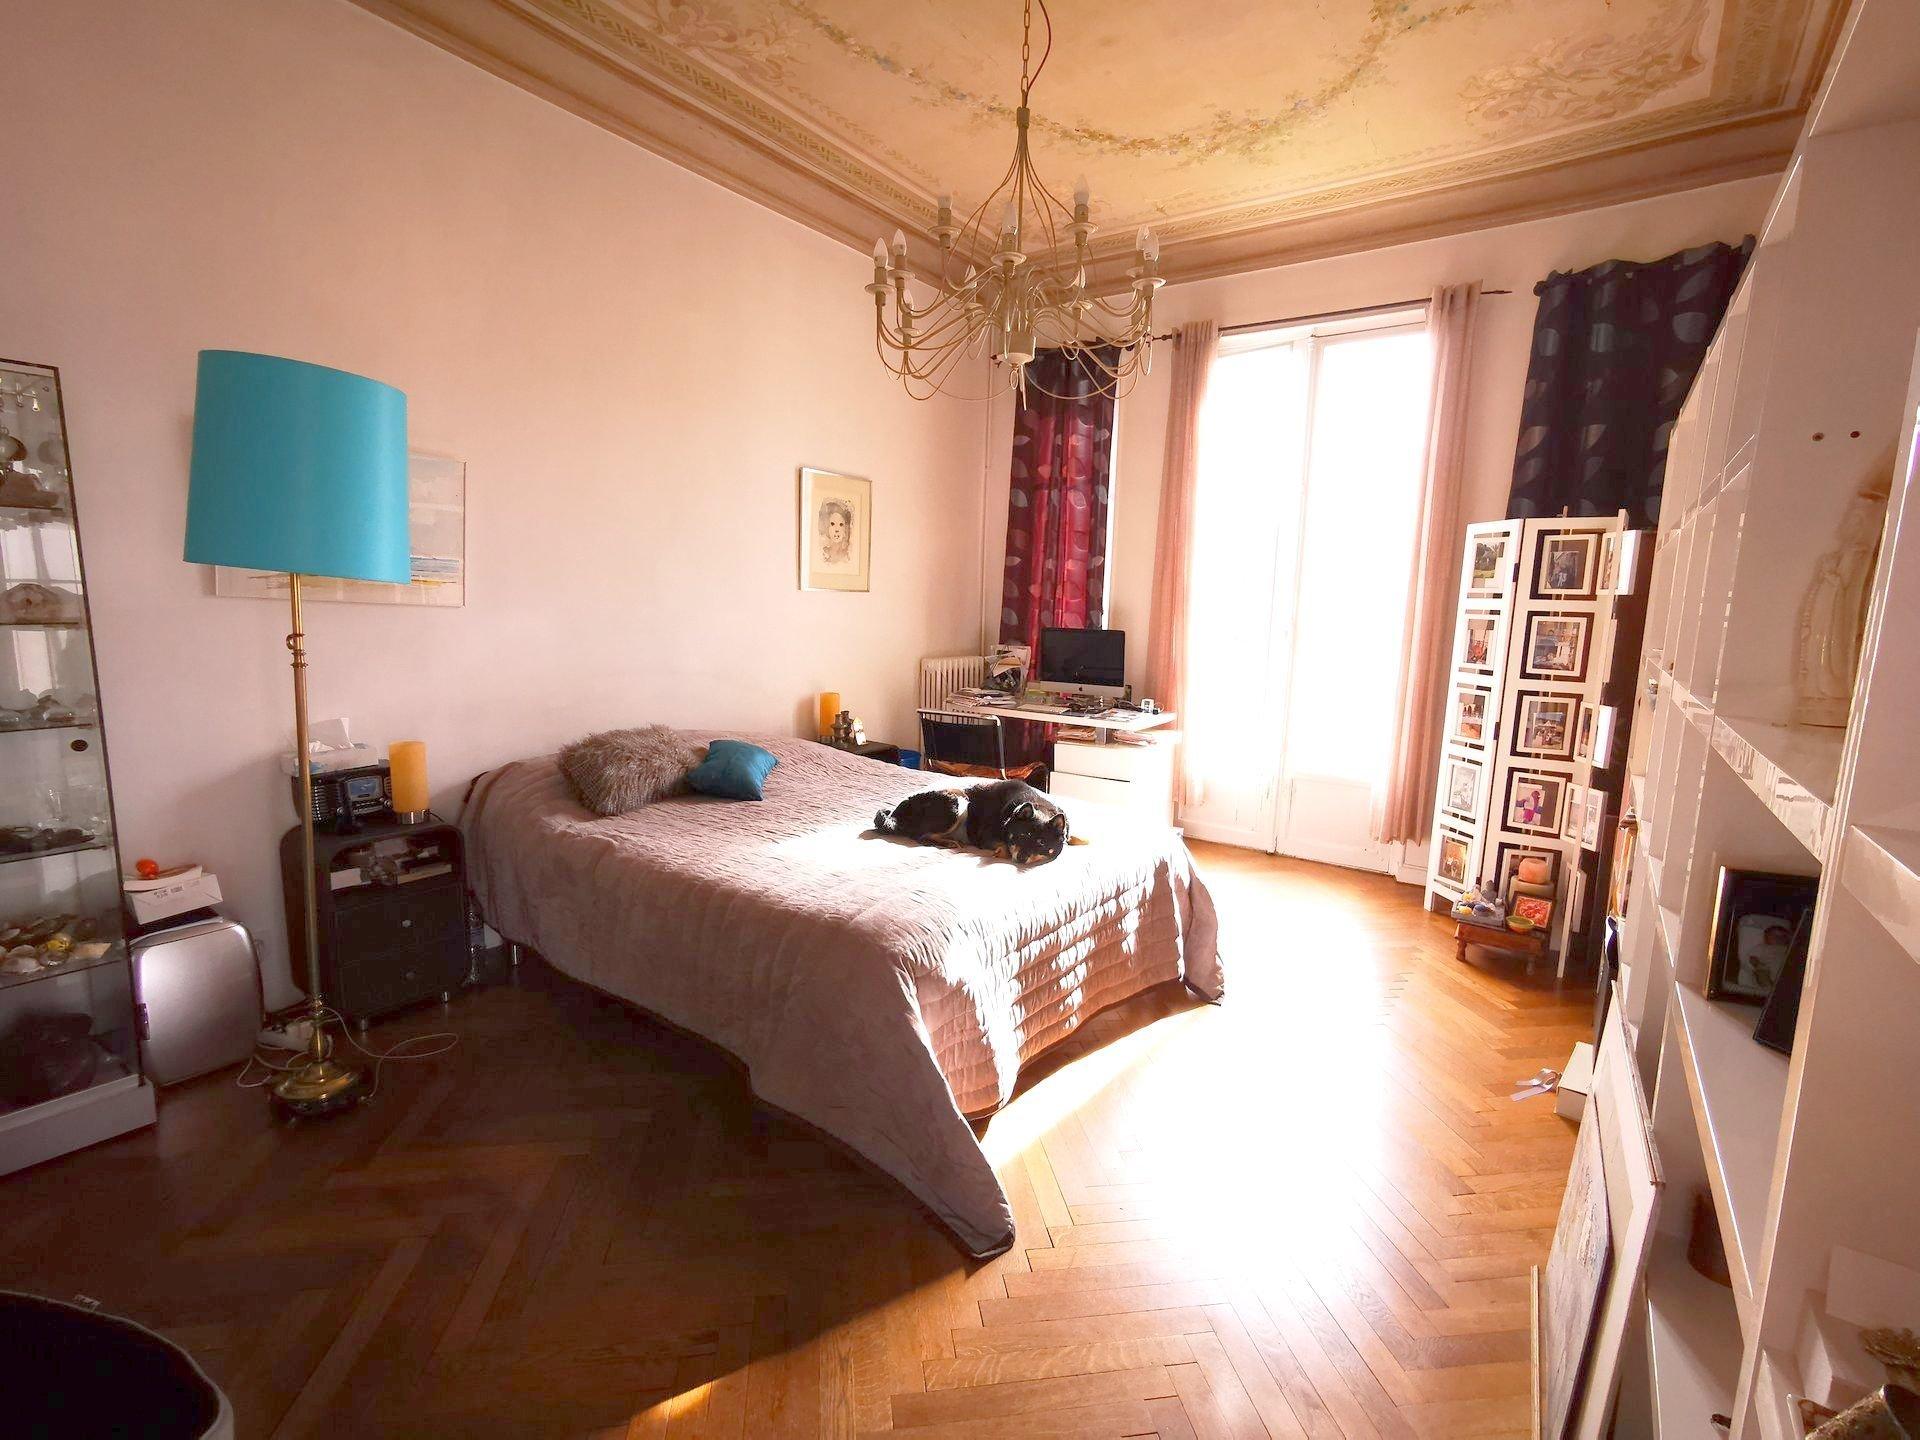 ALPES-MARITIMES(06) NICE VILLA ARSON VENTE HOTEL PARTICULIER BELLE EPOQUE